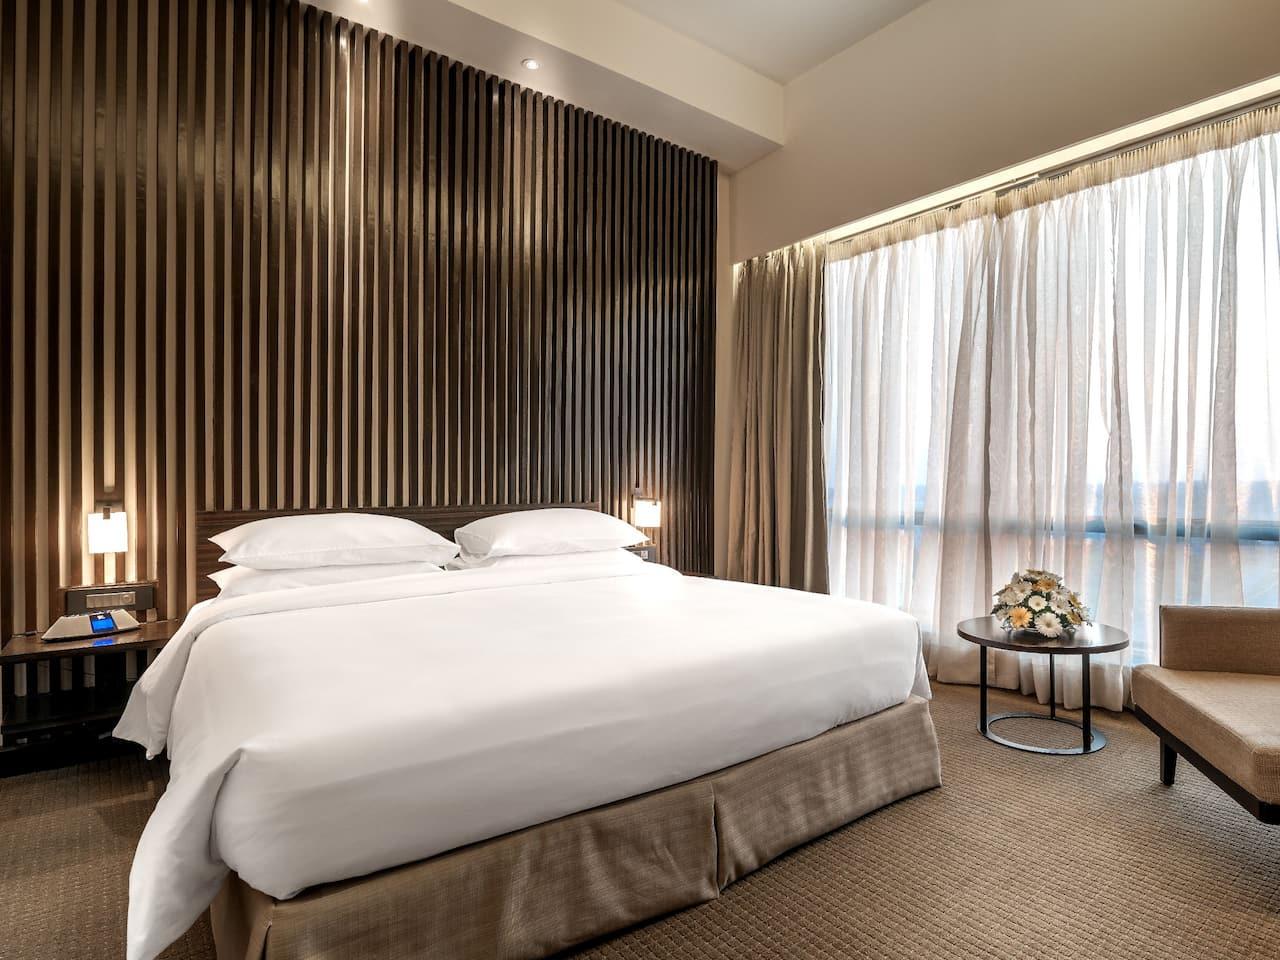 Hyatt Raipur Bedroom